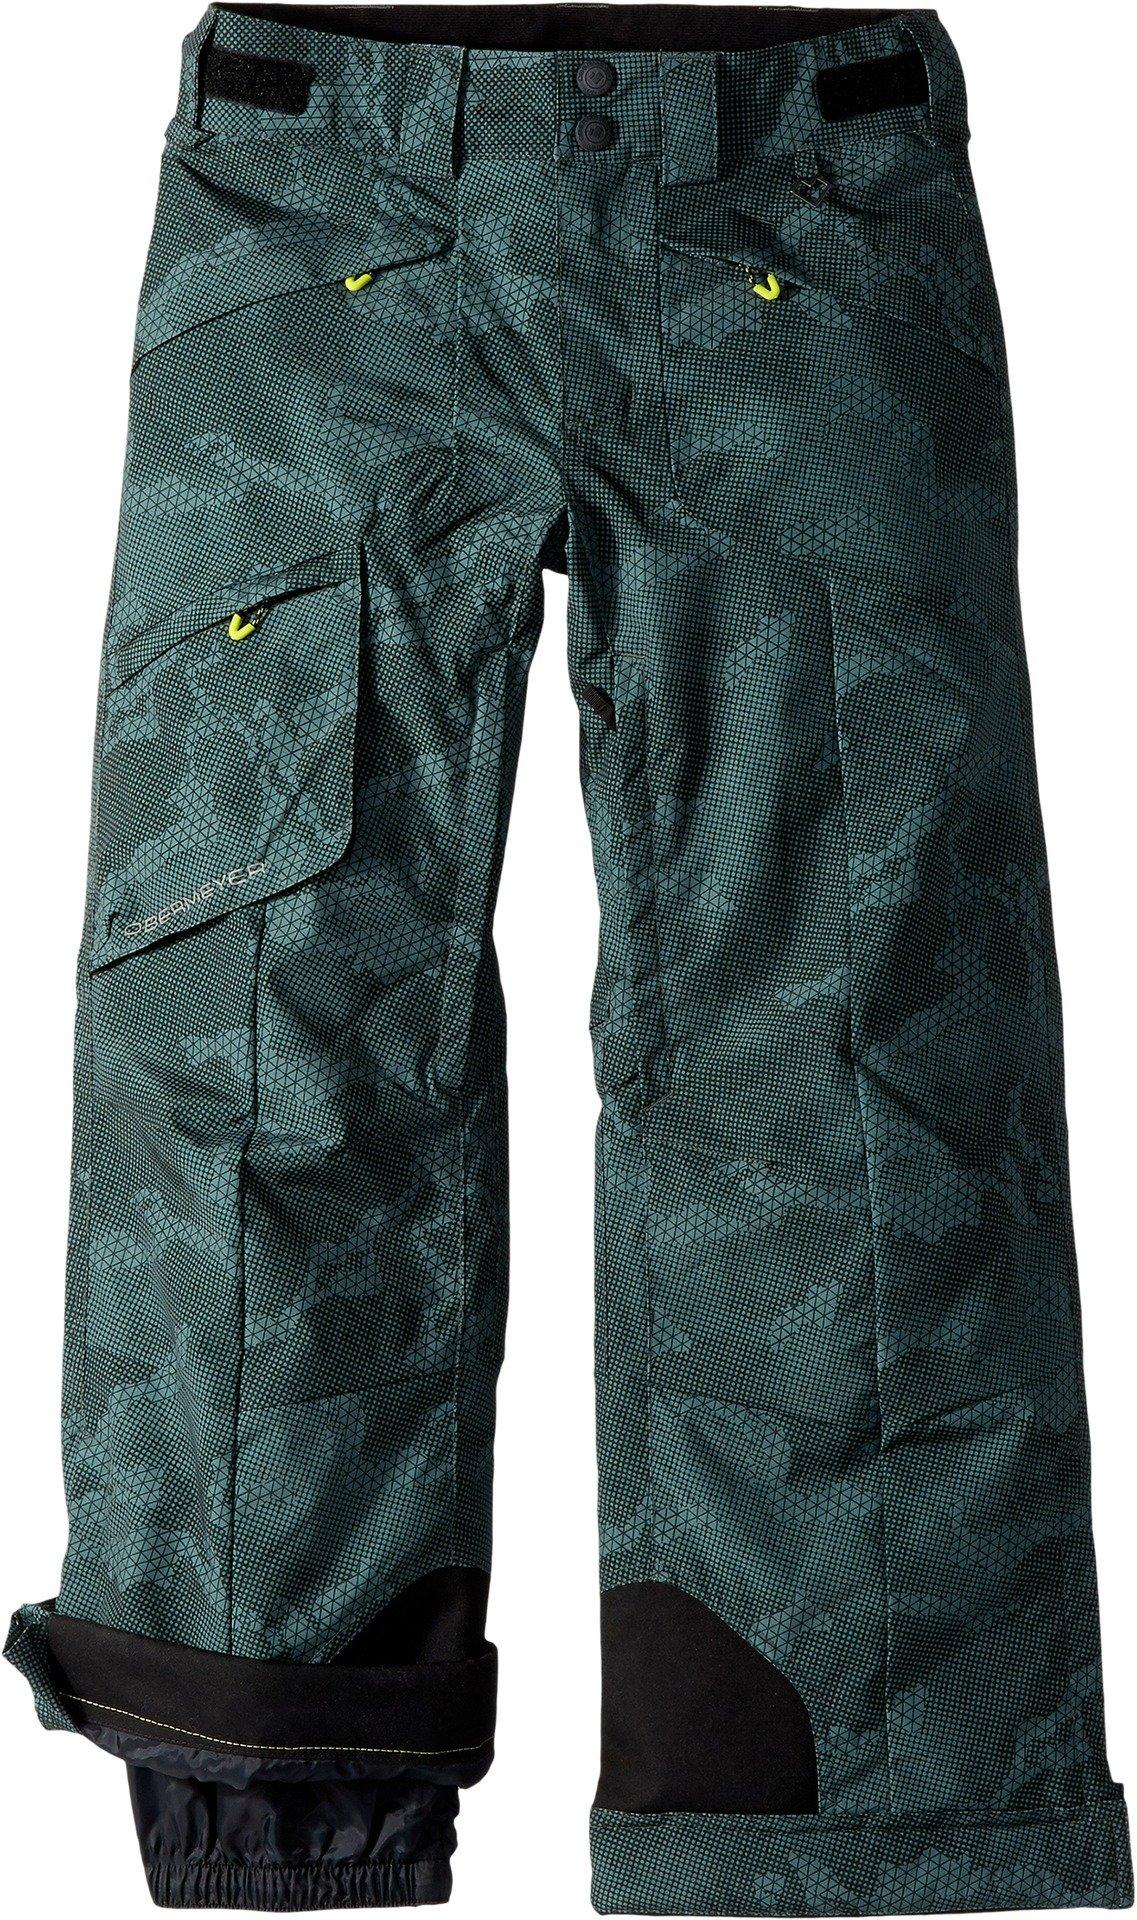 Obermeyer Kids Boy's Porter Pants (Little Kids/Big Kids) Bit Camo Medium by Obermeyer Kids